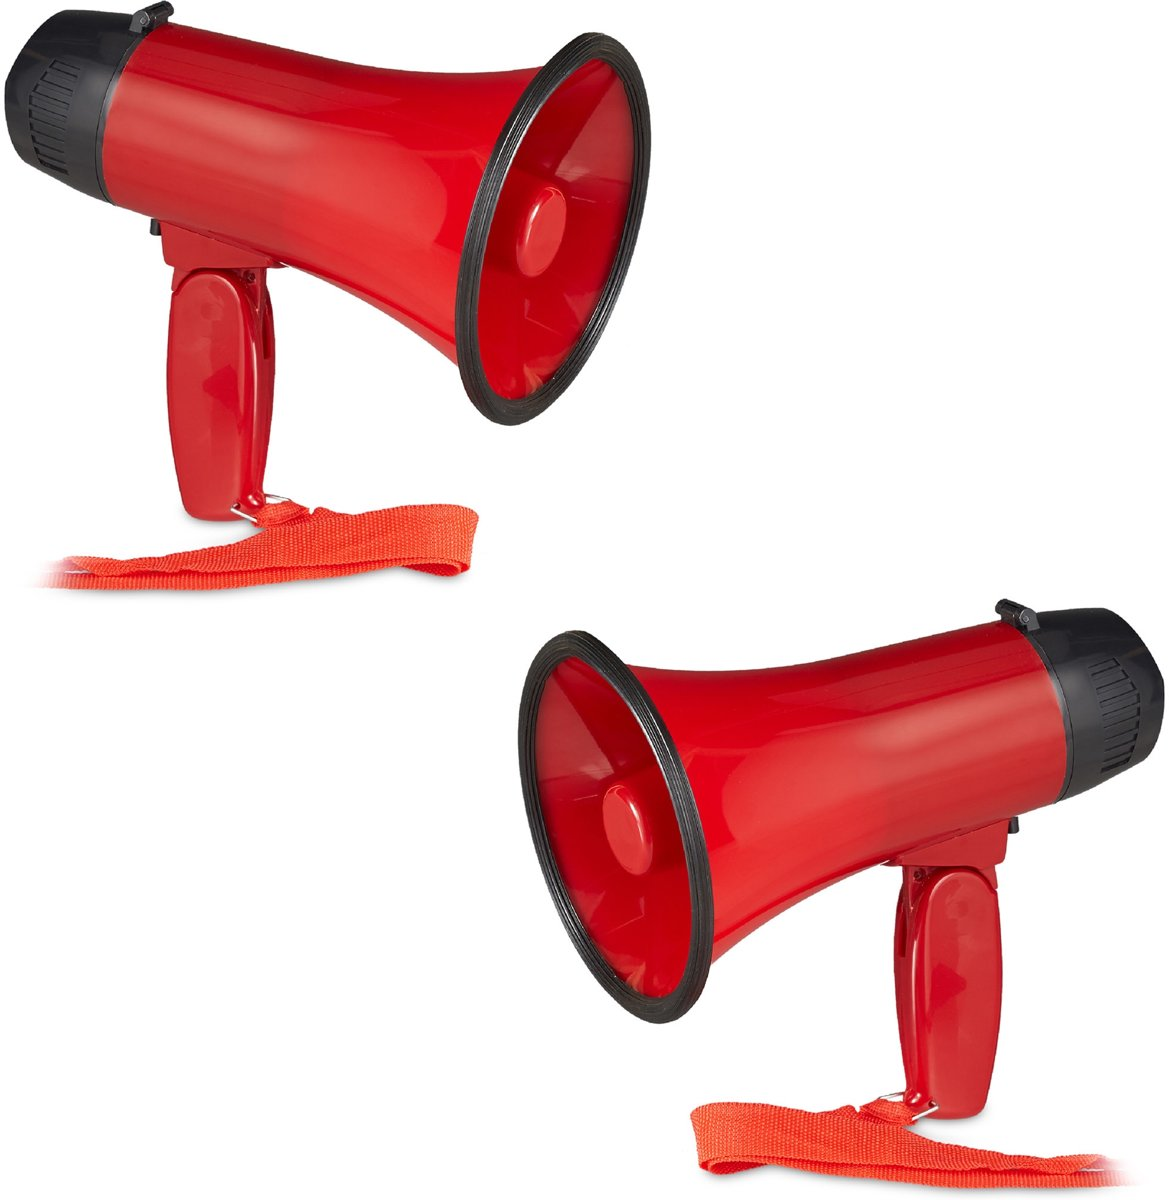 relaxdays 2 x megafoon grappig - megaphone kunststof - rood - stemversterker - 10 watt